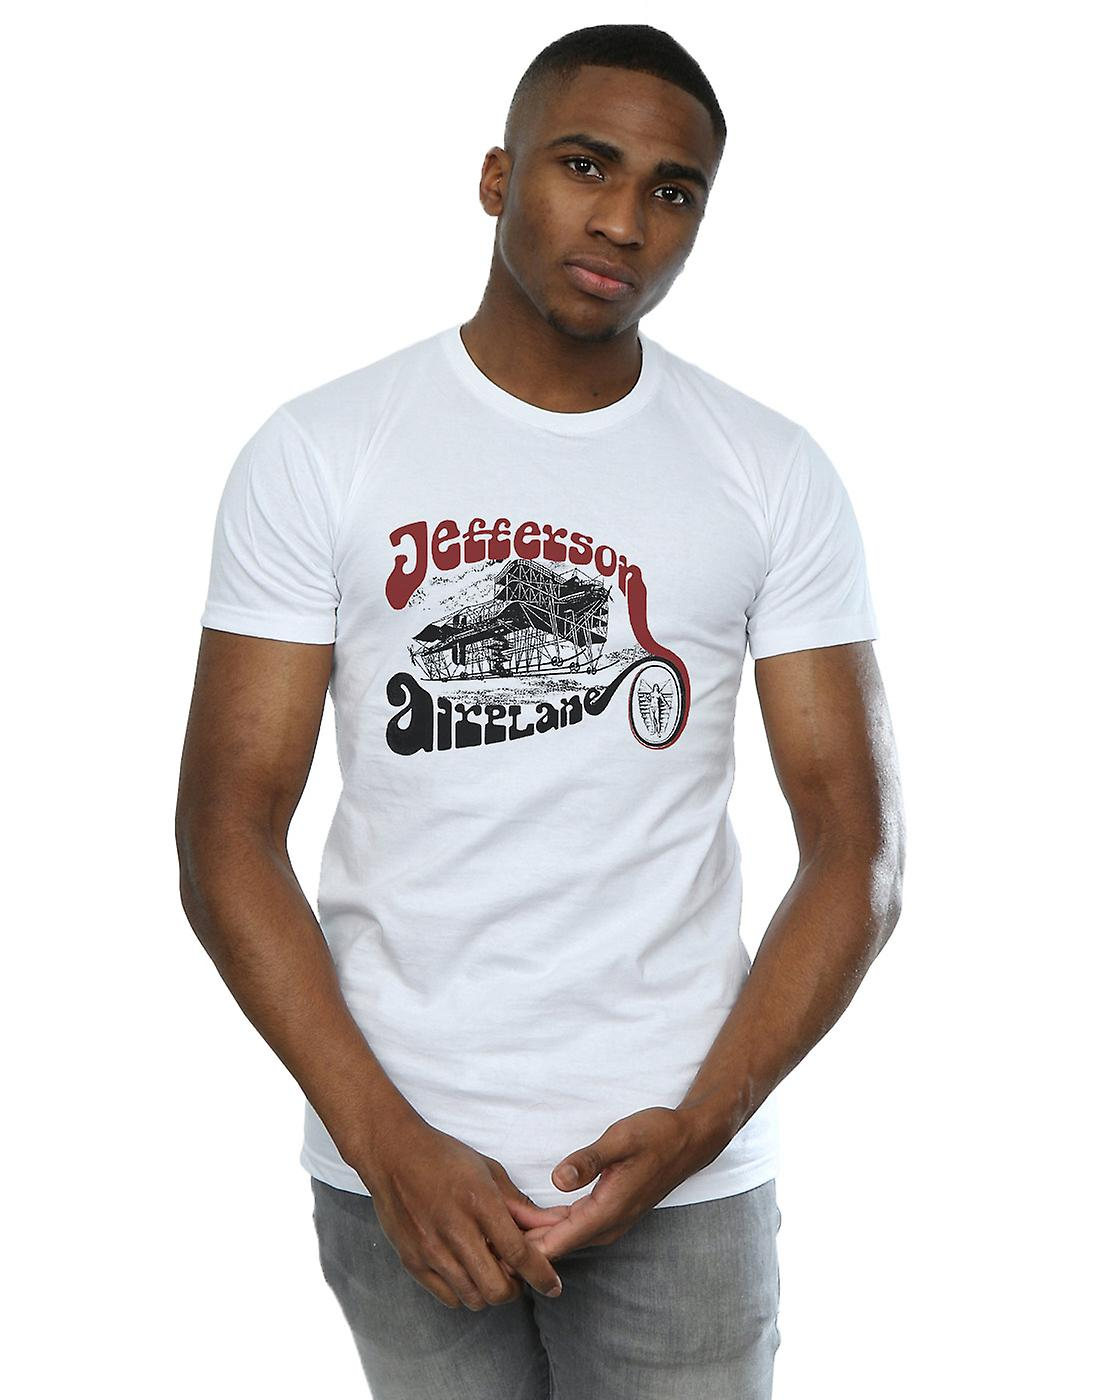 Jefferson Airplane Men's Vintage Plane T-Shirt